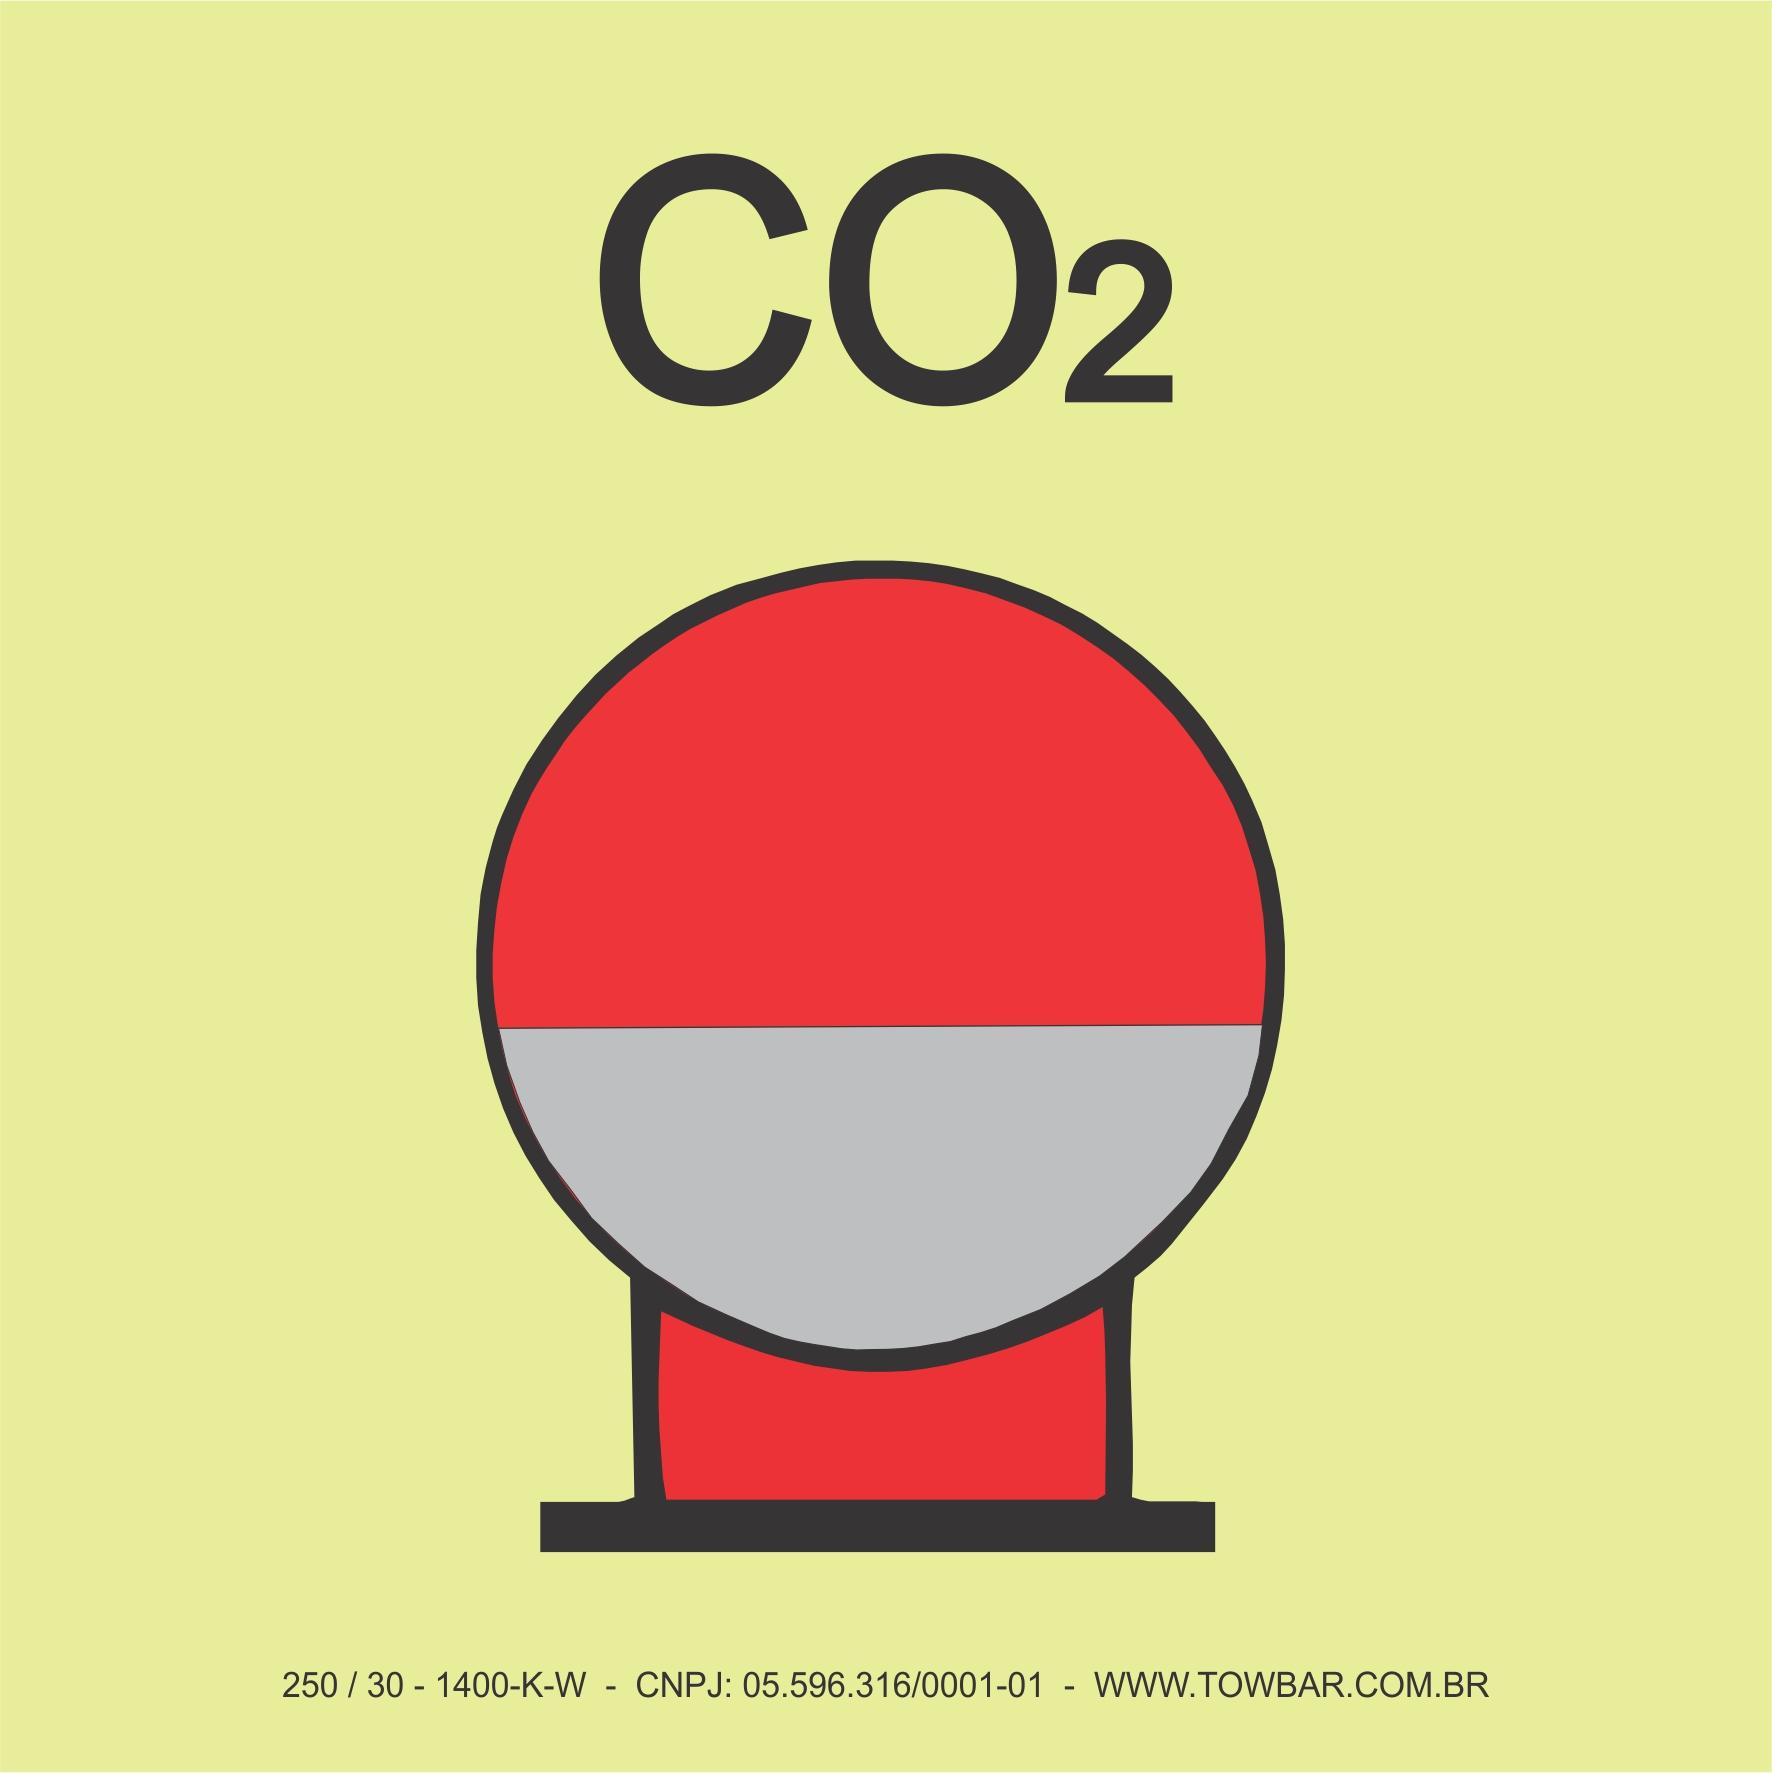 Garrafa de CO² em zona protegida (Fixed Fire Extinguishing Bottle (CO2))  - Towbar Sinalização de Segurança